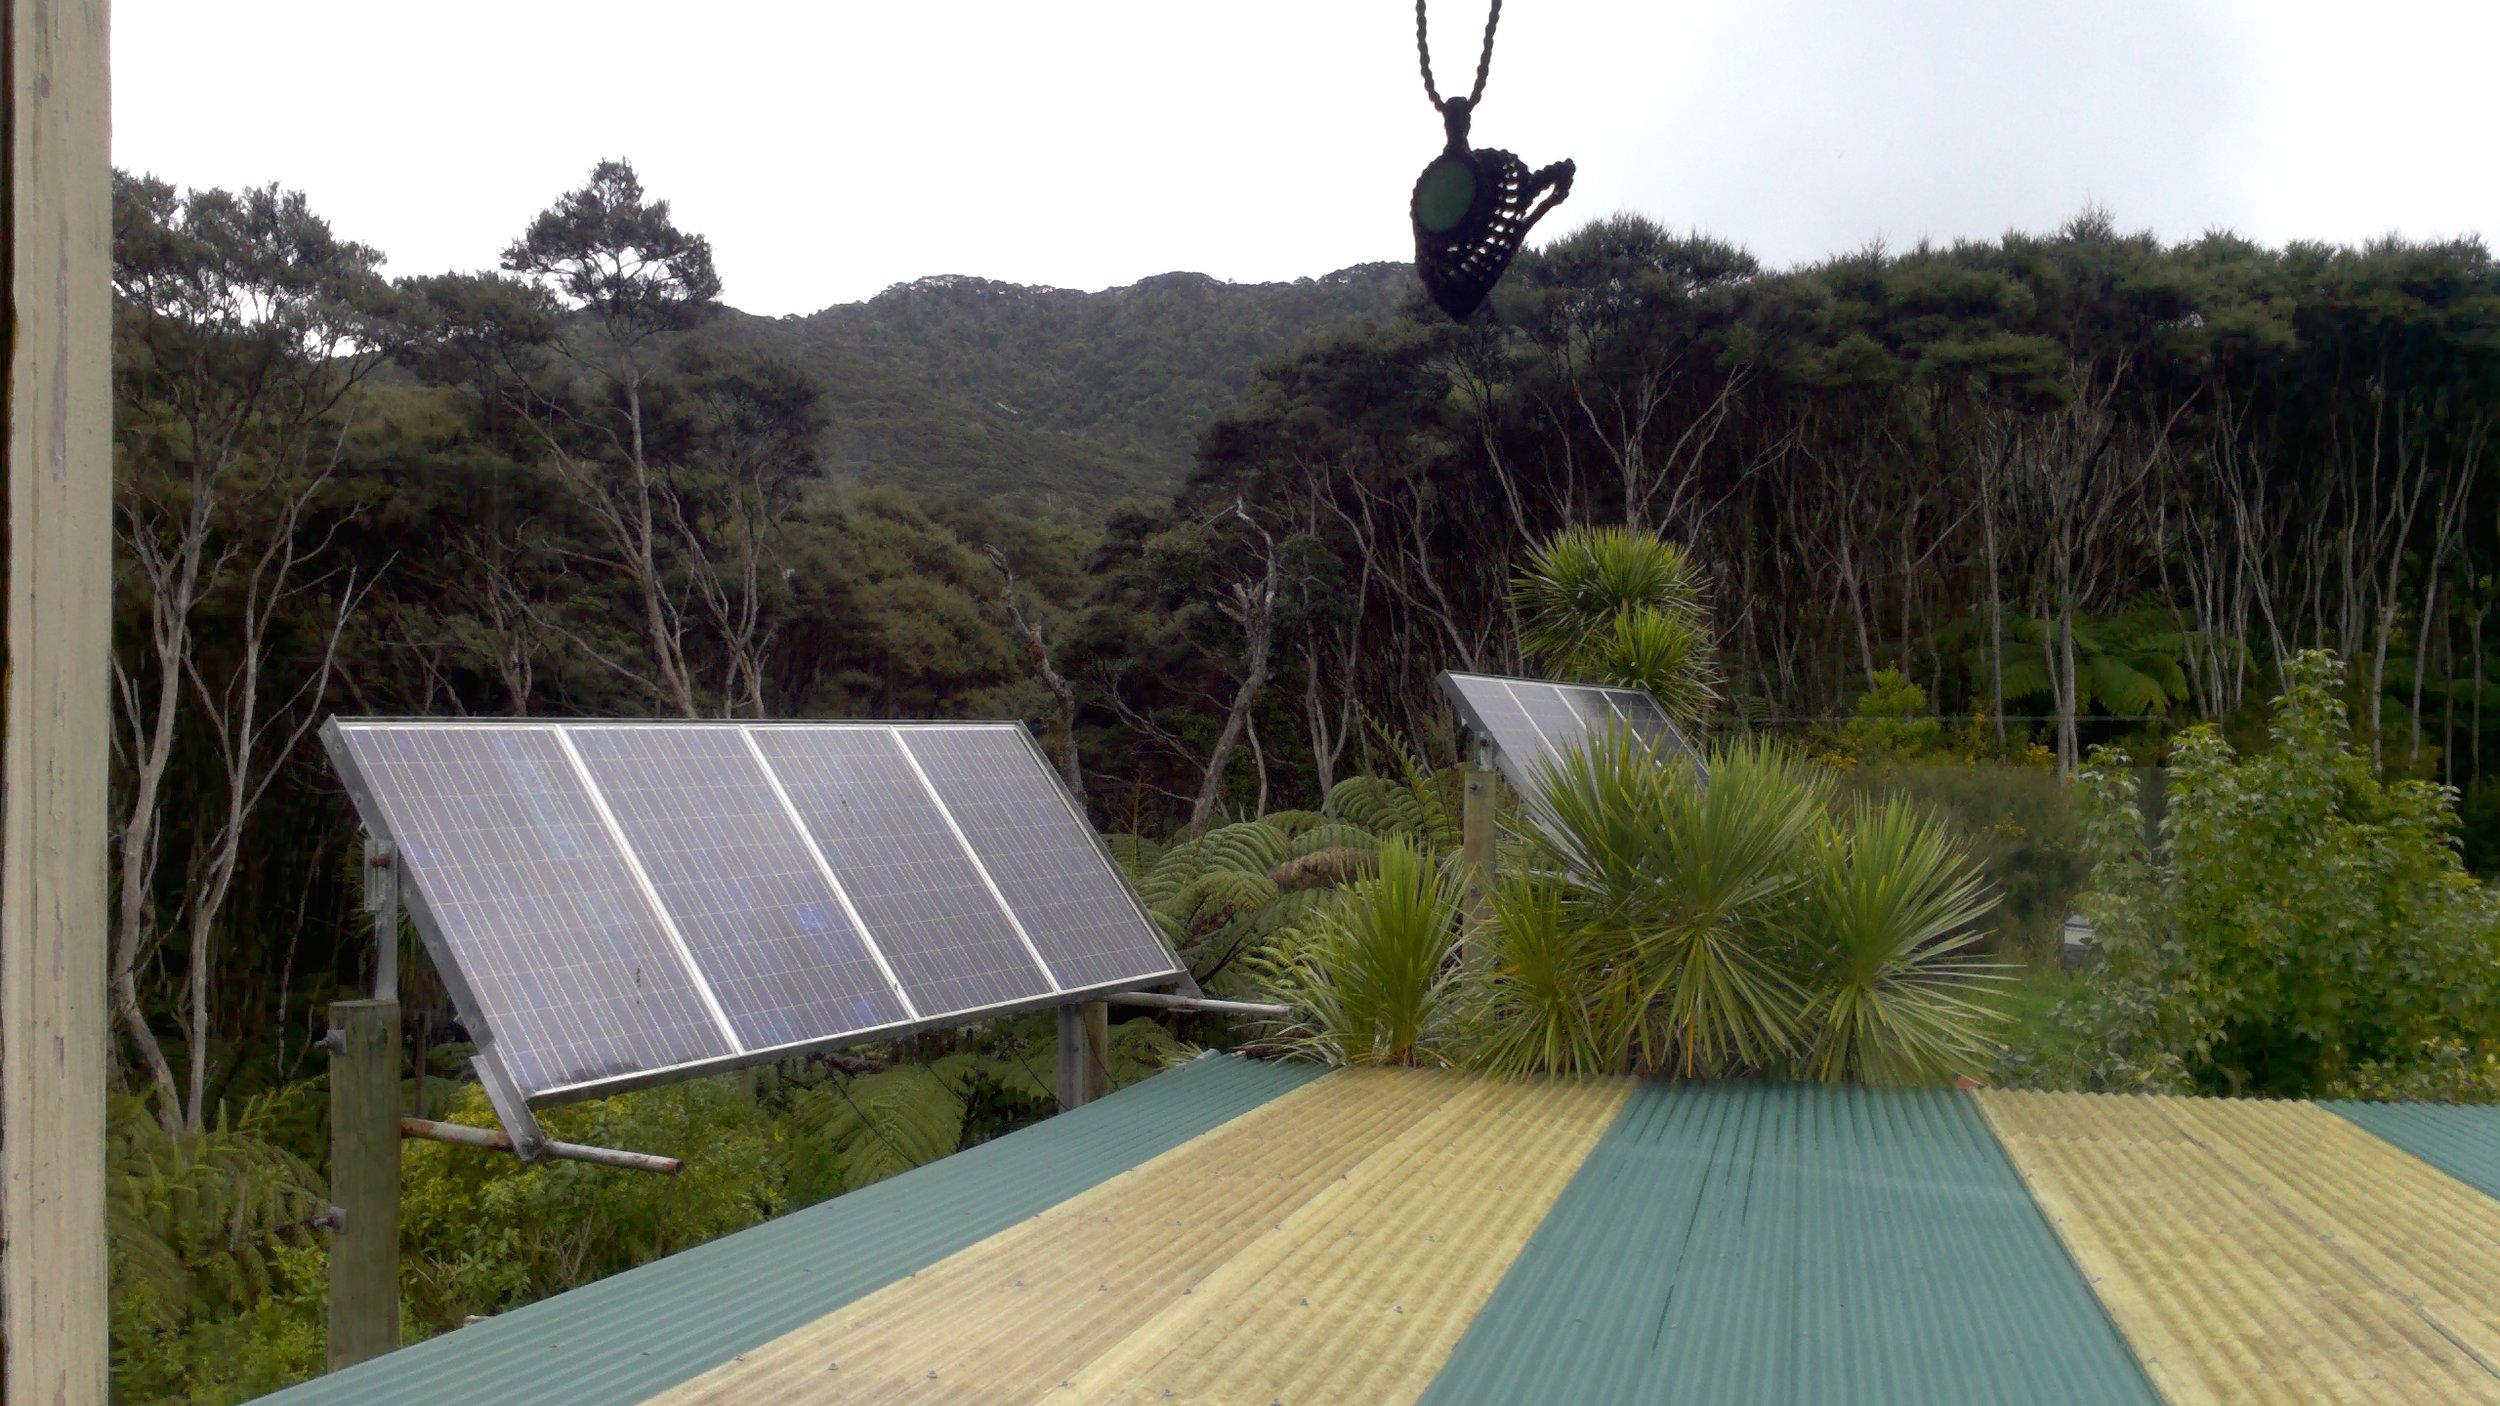 Mike's Solar Panels